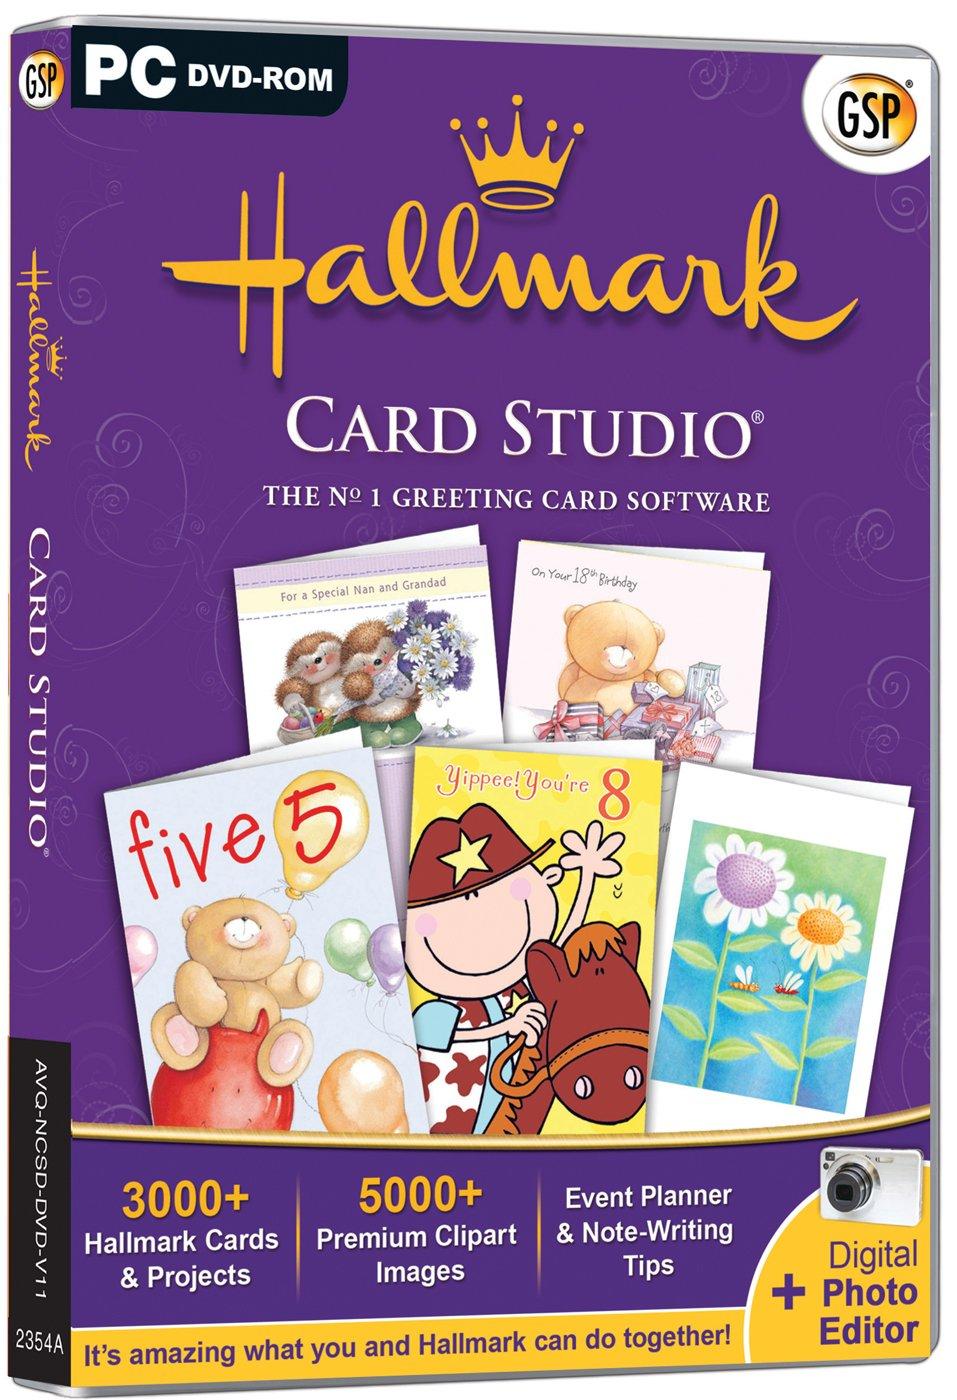 Hallmark card studio pc amazon software kristyandbryce Image collections